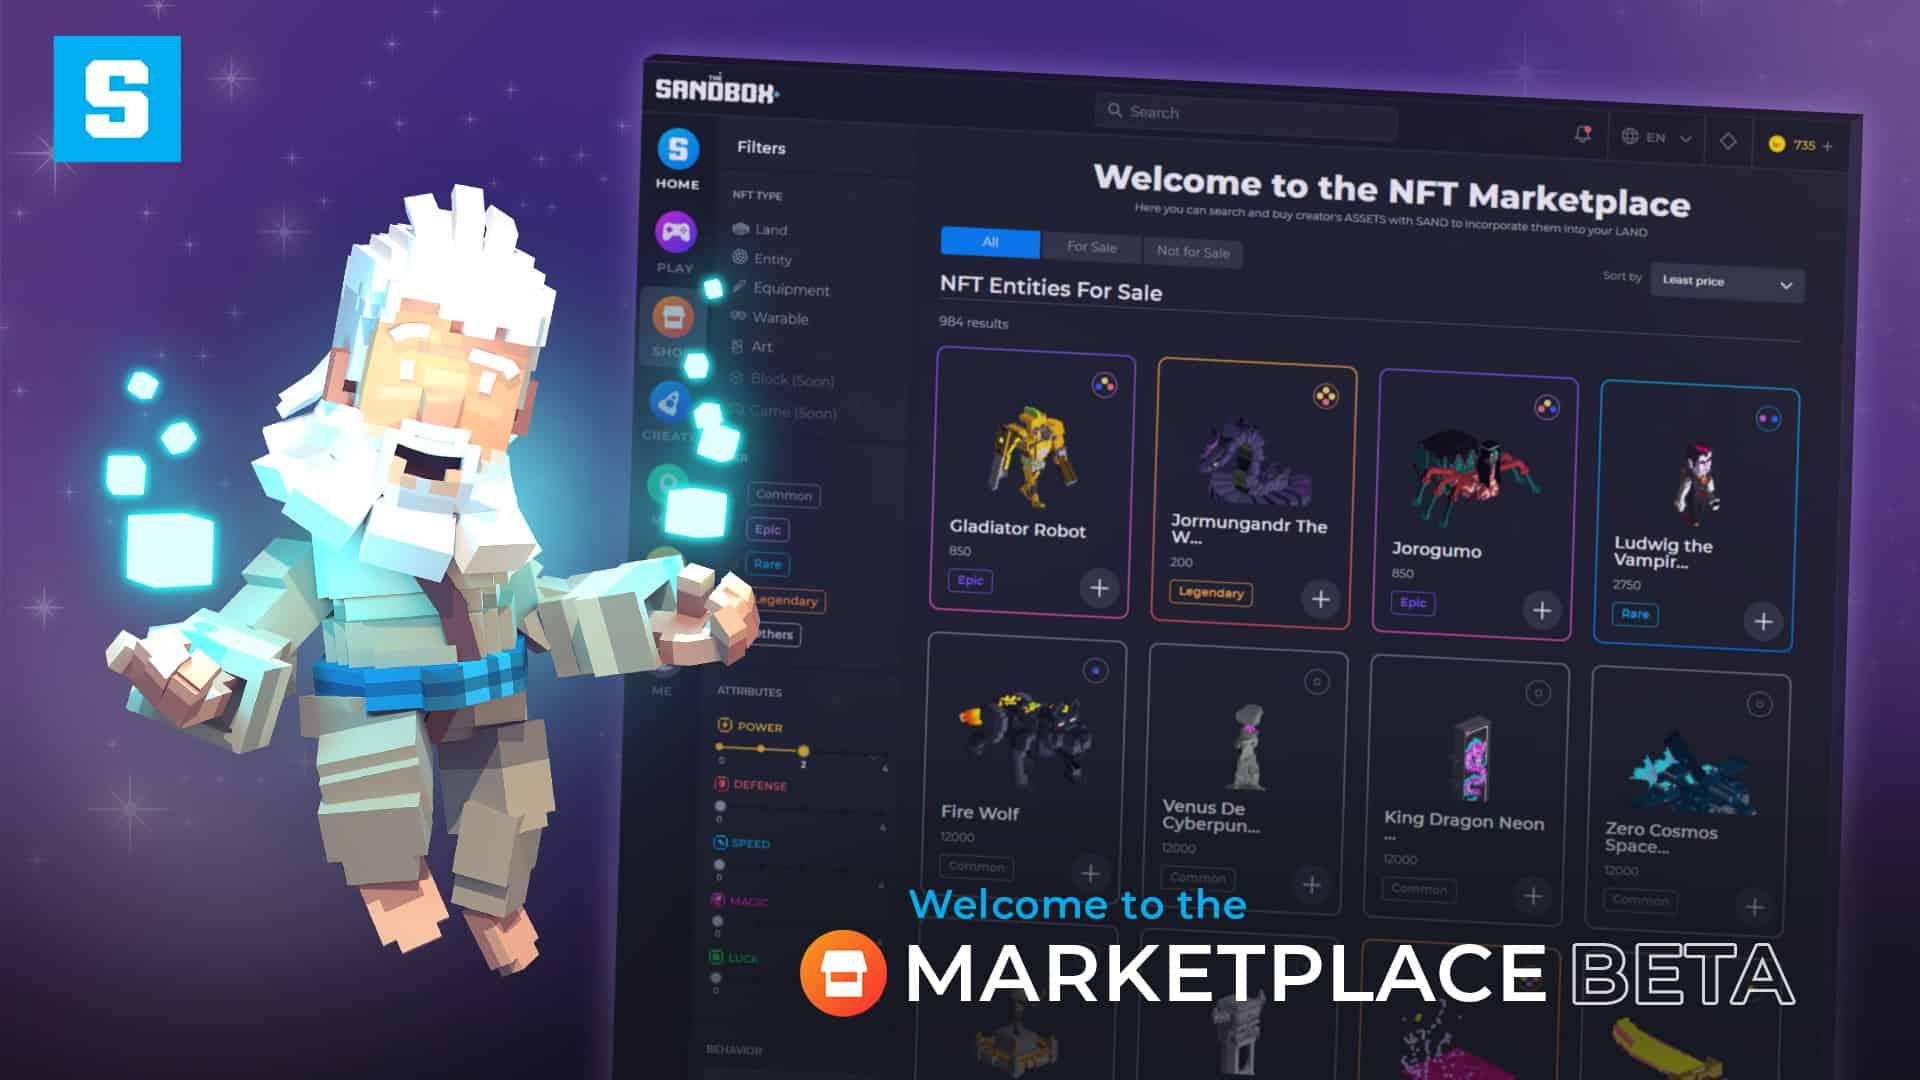 The Sandbox Marketplace Beta